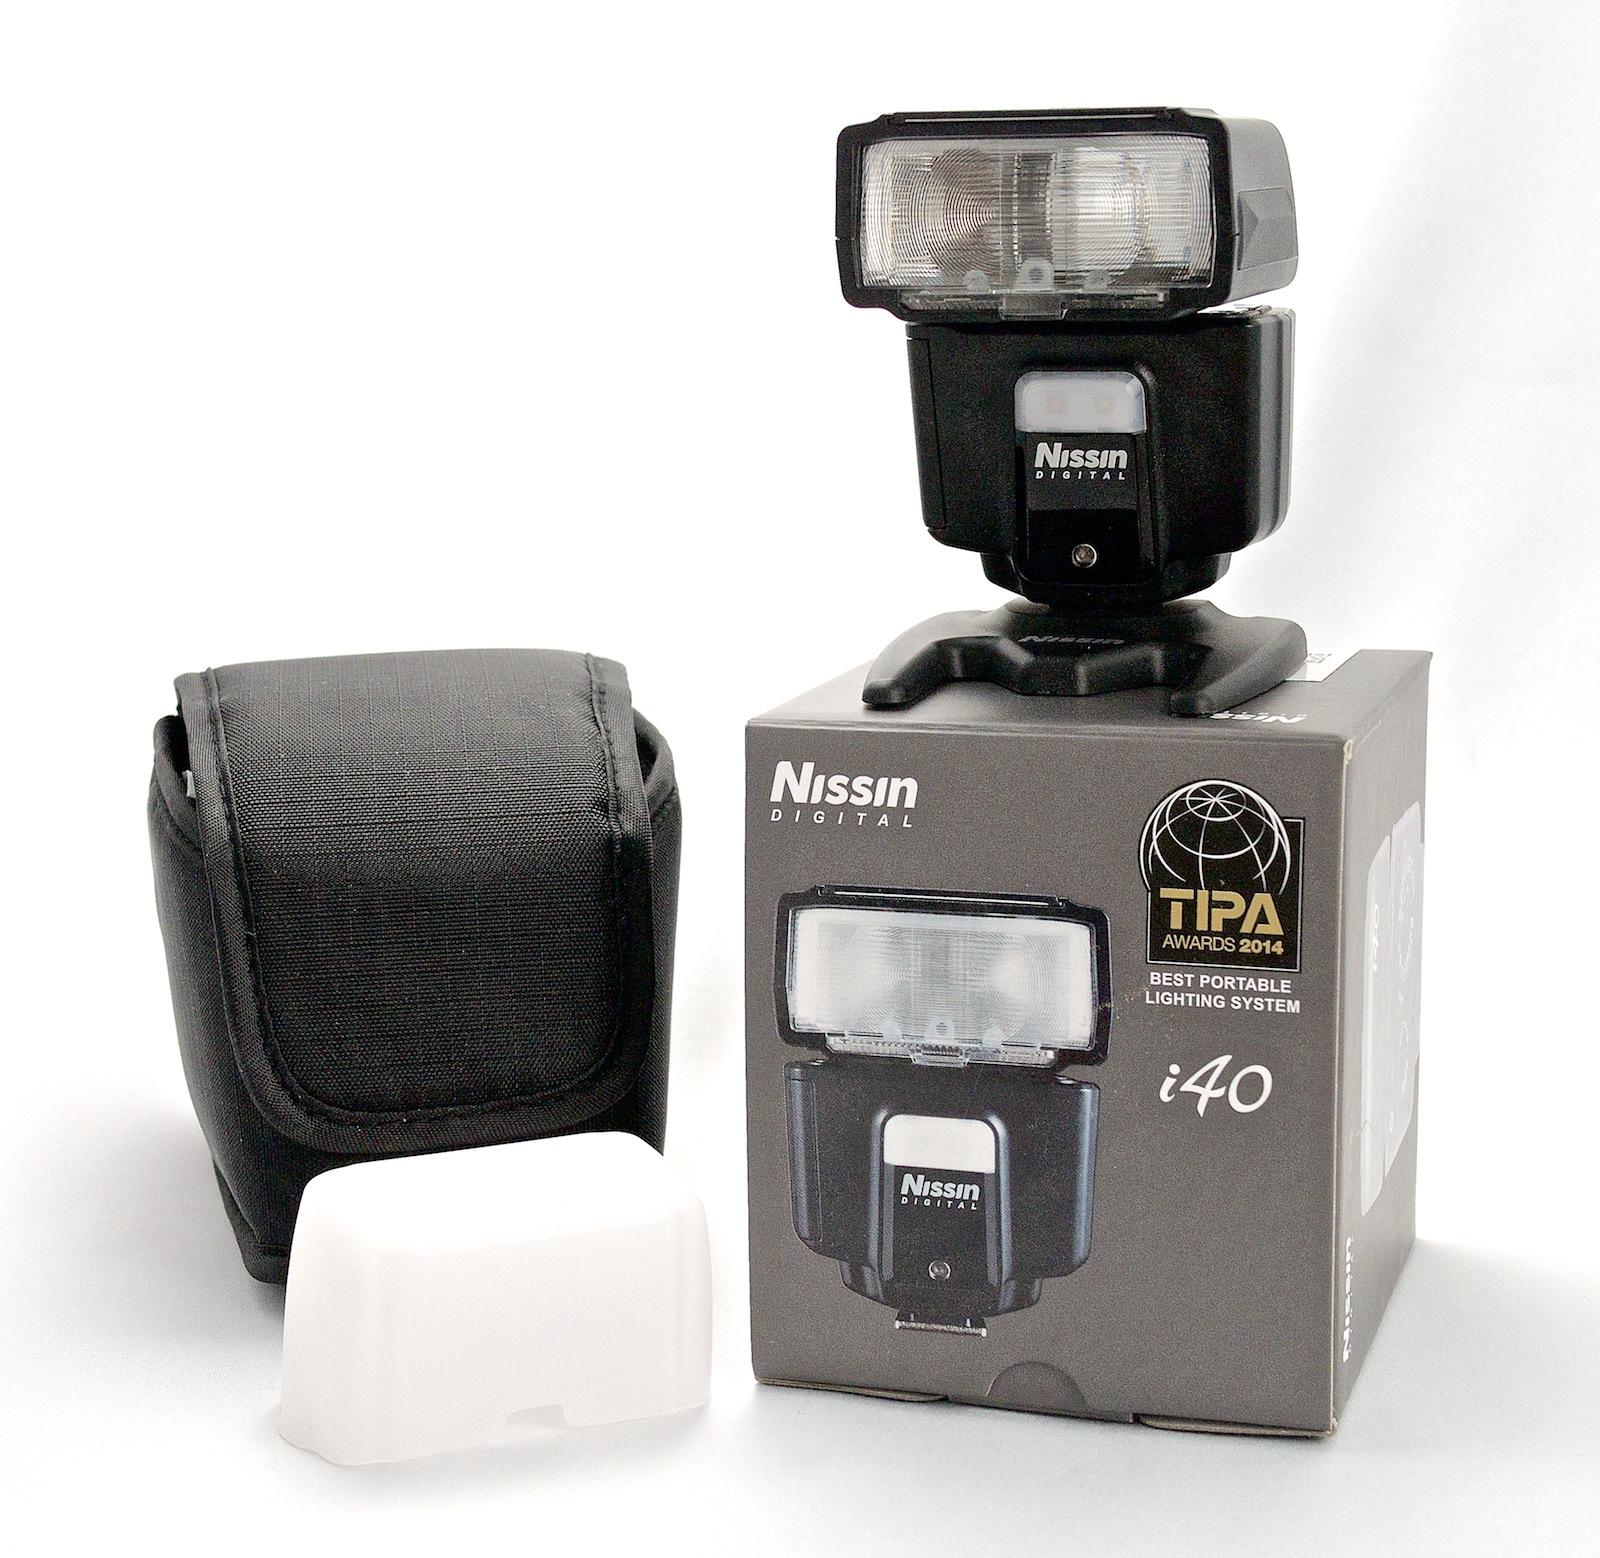 http://thedigitalstory.com/2014/09/30/nissin-i40-kit.jpg